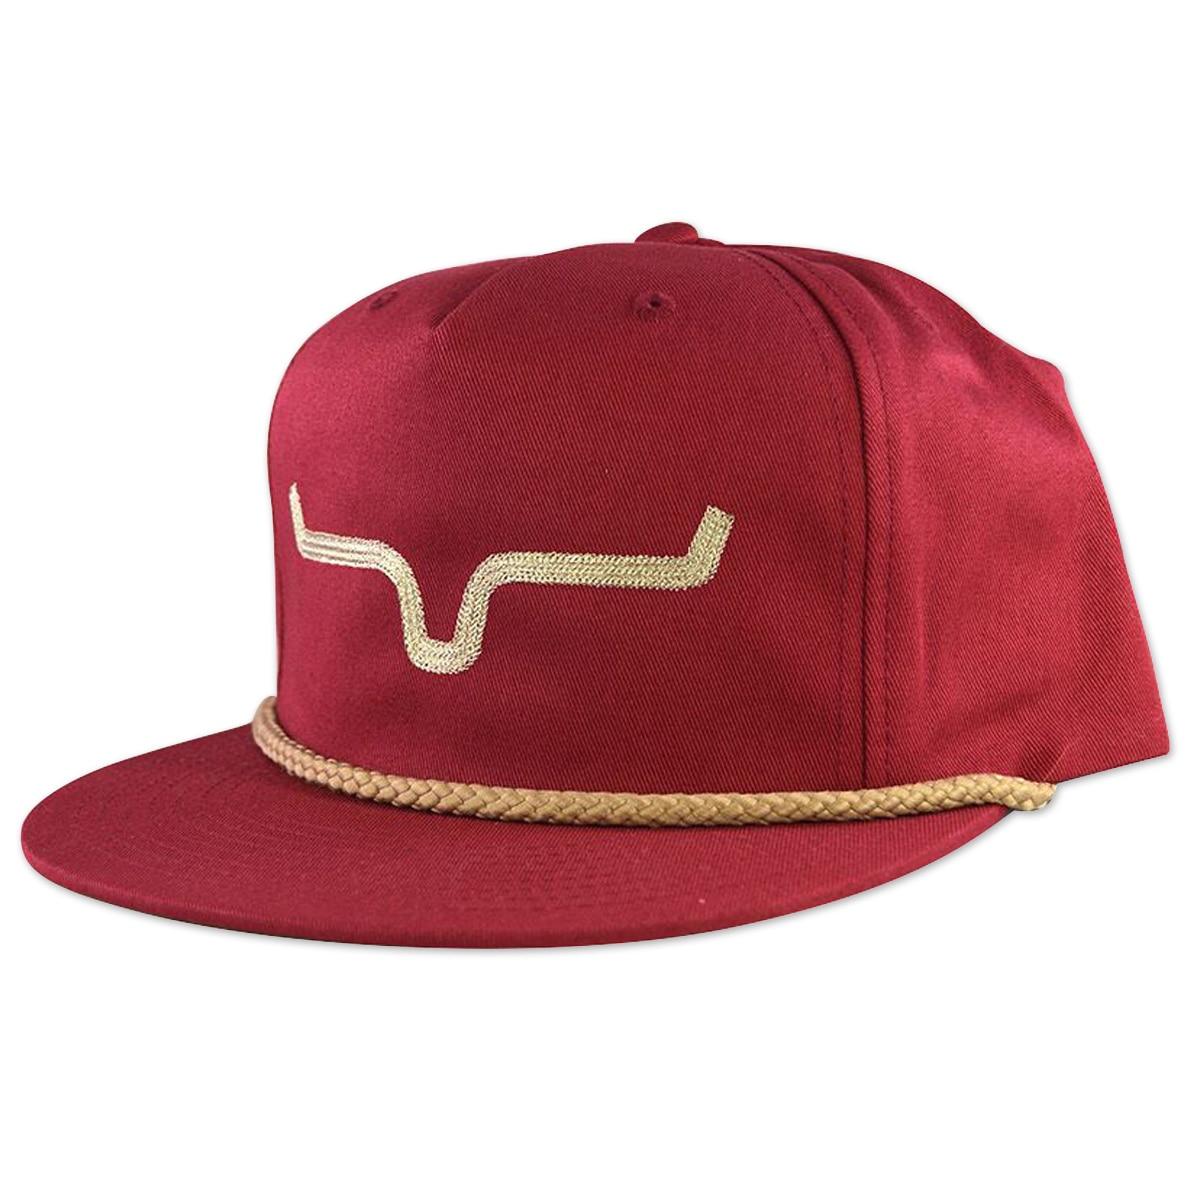 Kimes Ranch Dad s Golf Hat 80ed3ba8586